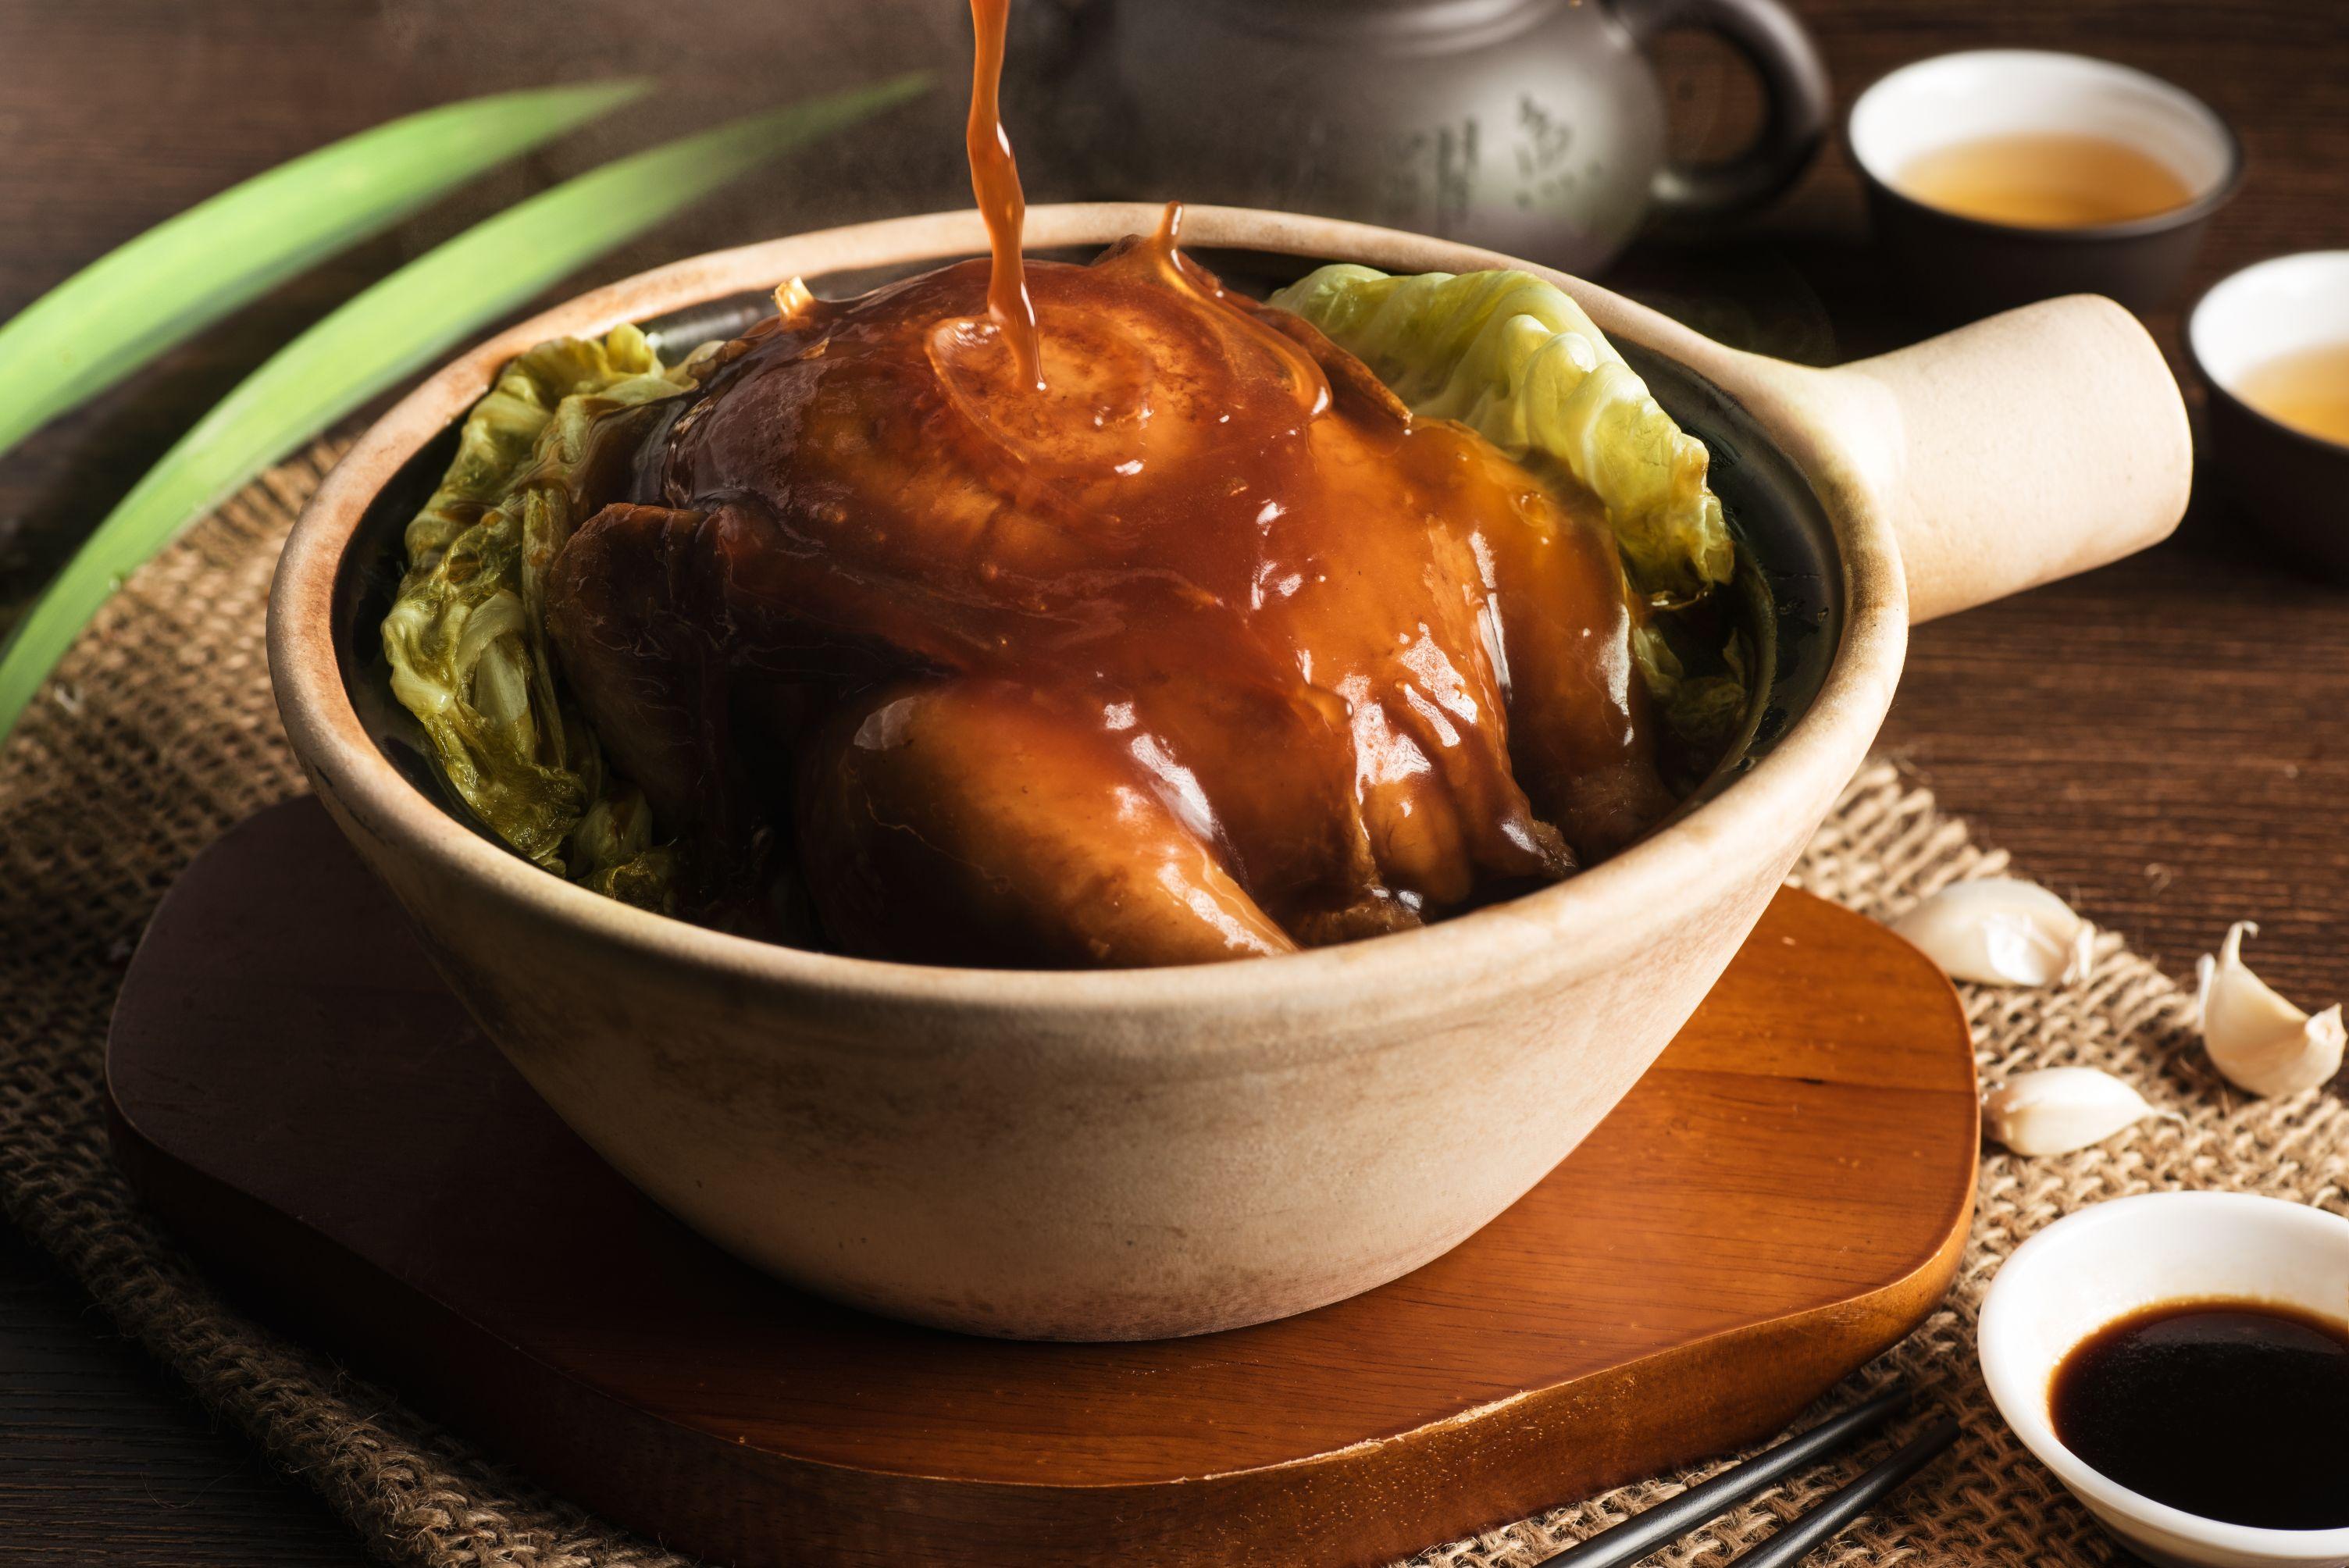 1 x Kia Hiang Claypot Spring Chicken